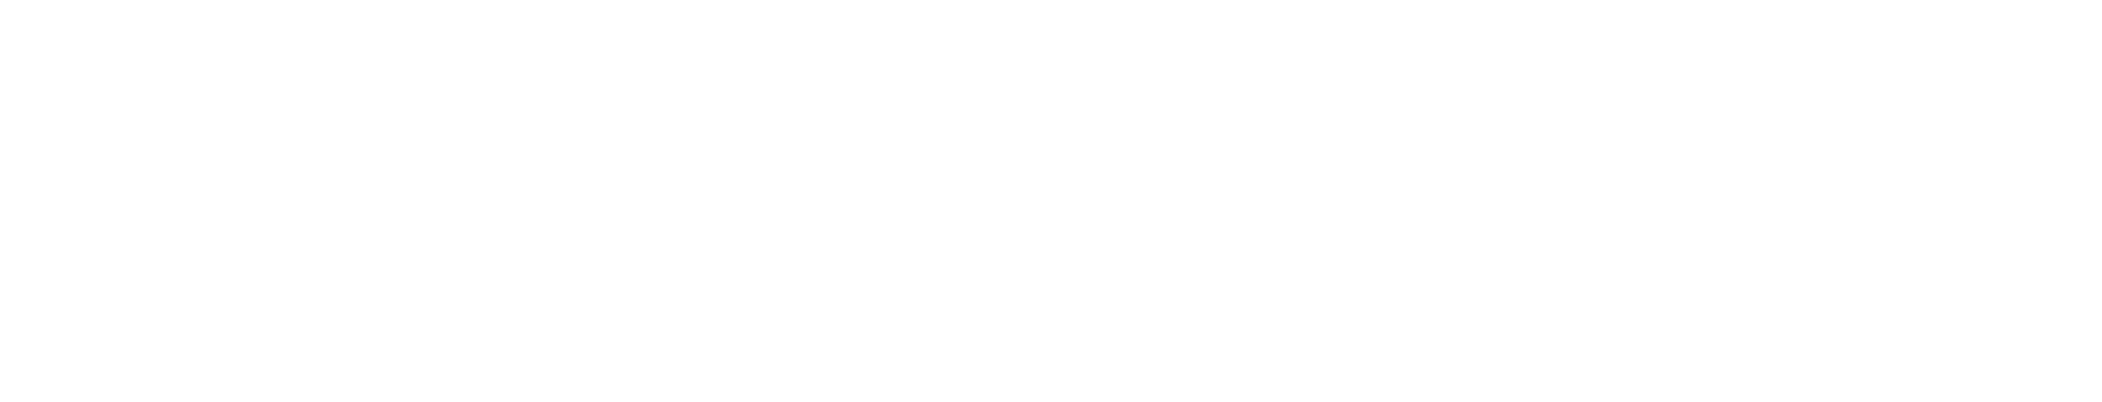 climatisation-icone